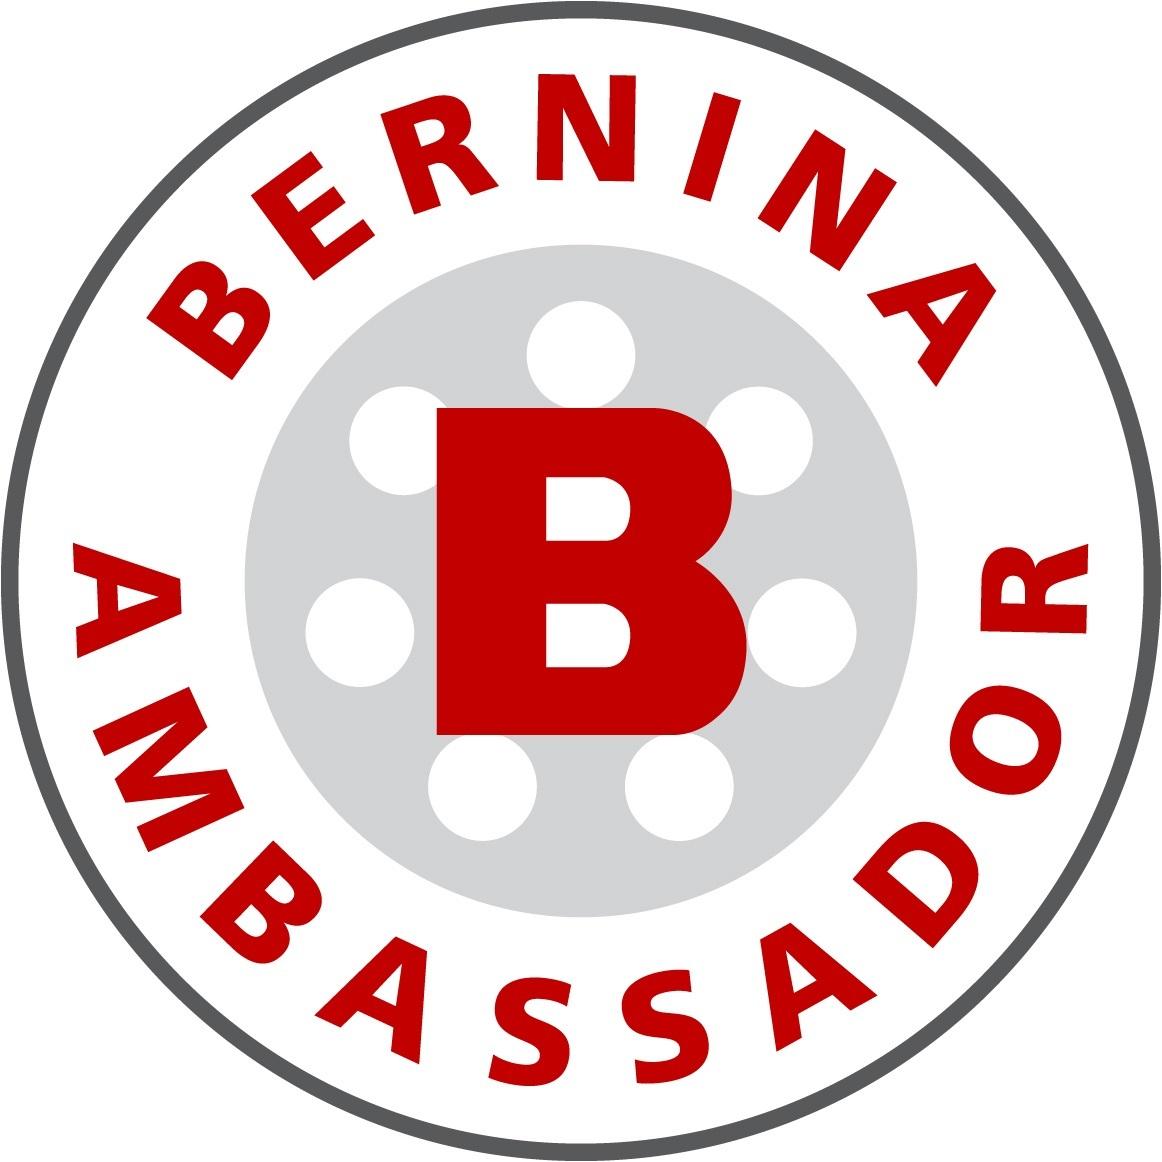 proudly representing bernina usa since 2019